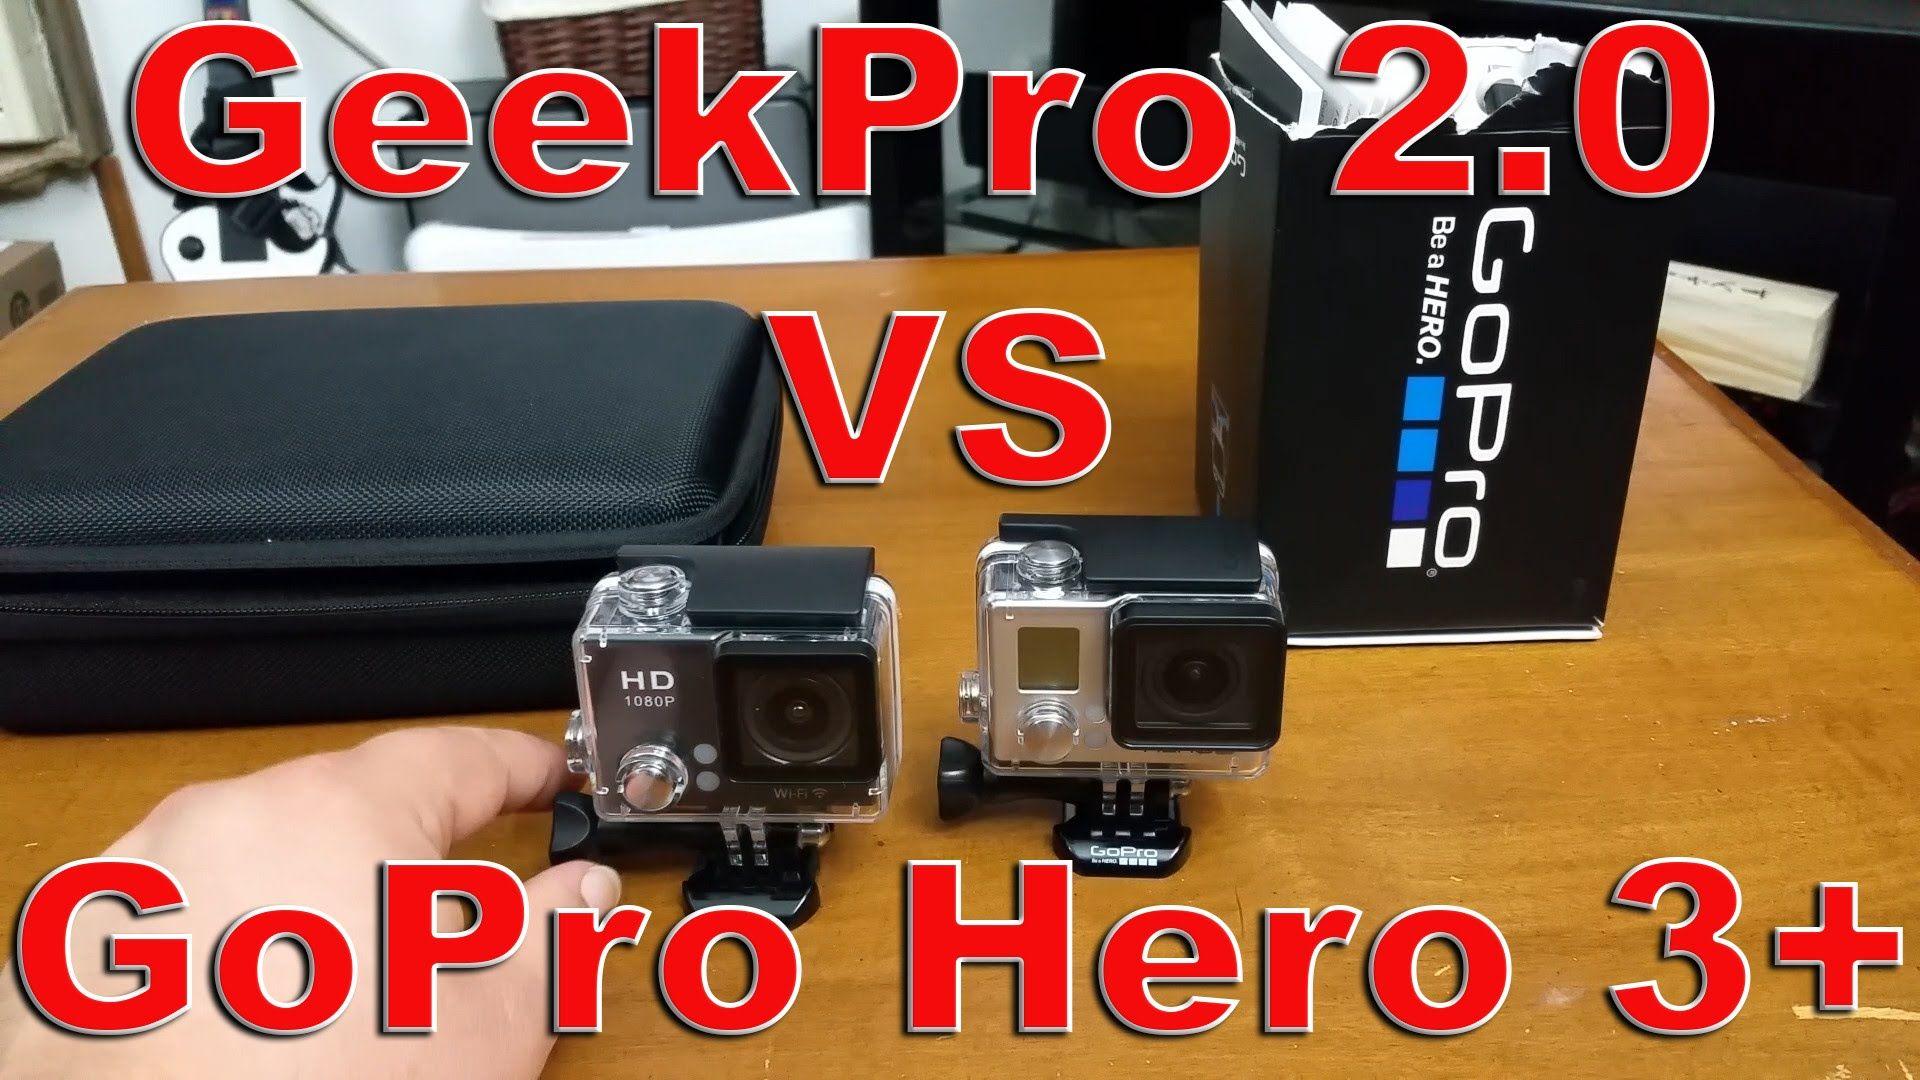 Geekpro Camera Review : Gopro hero vs geekpro p action cam comparo action